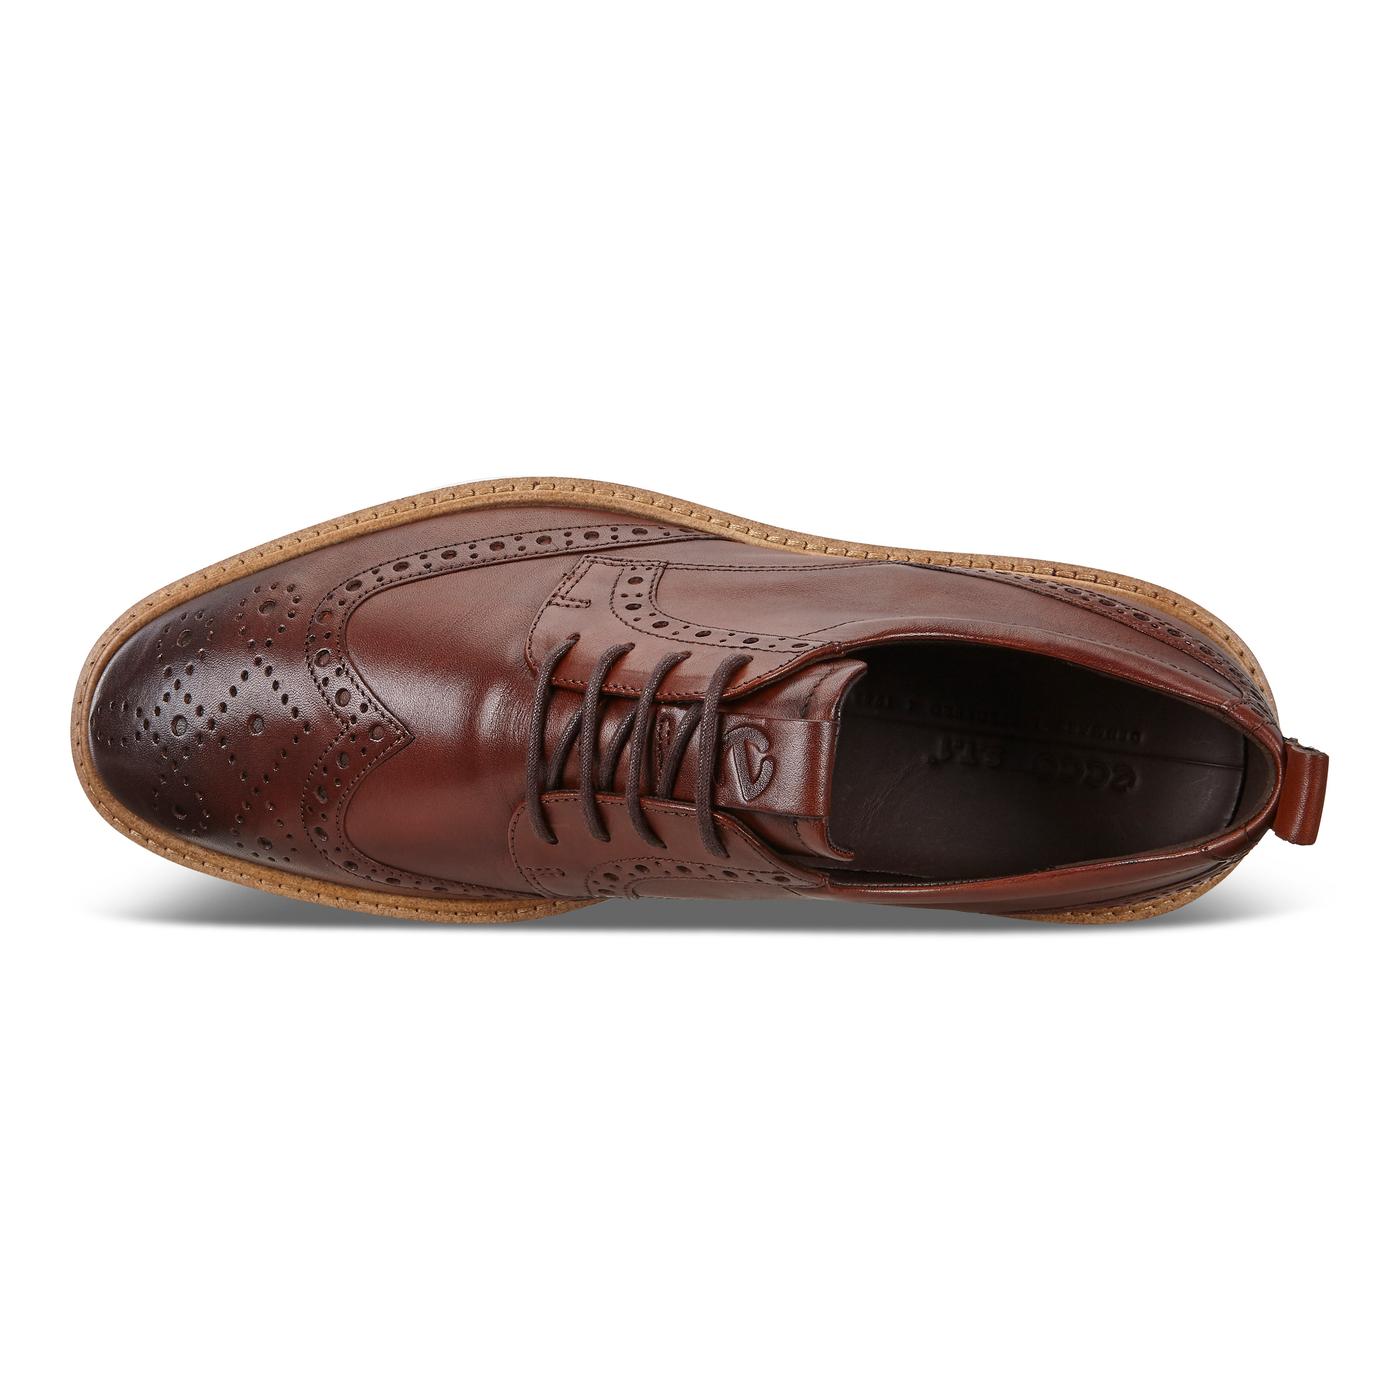 ECCO ST.1 HYBRID Wingtip Shoe